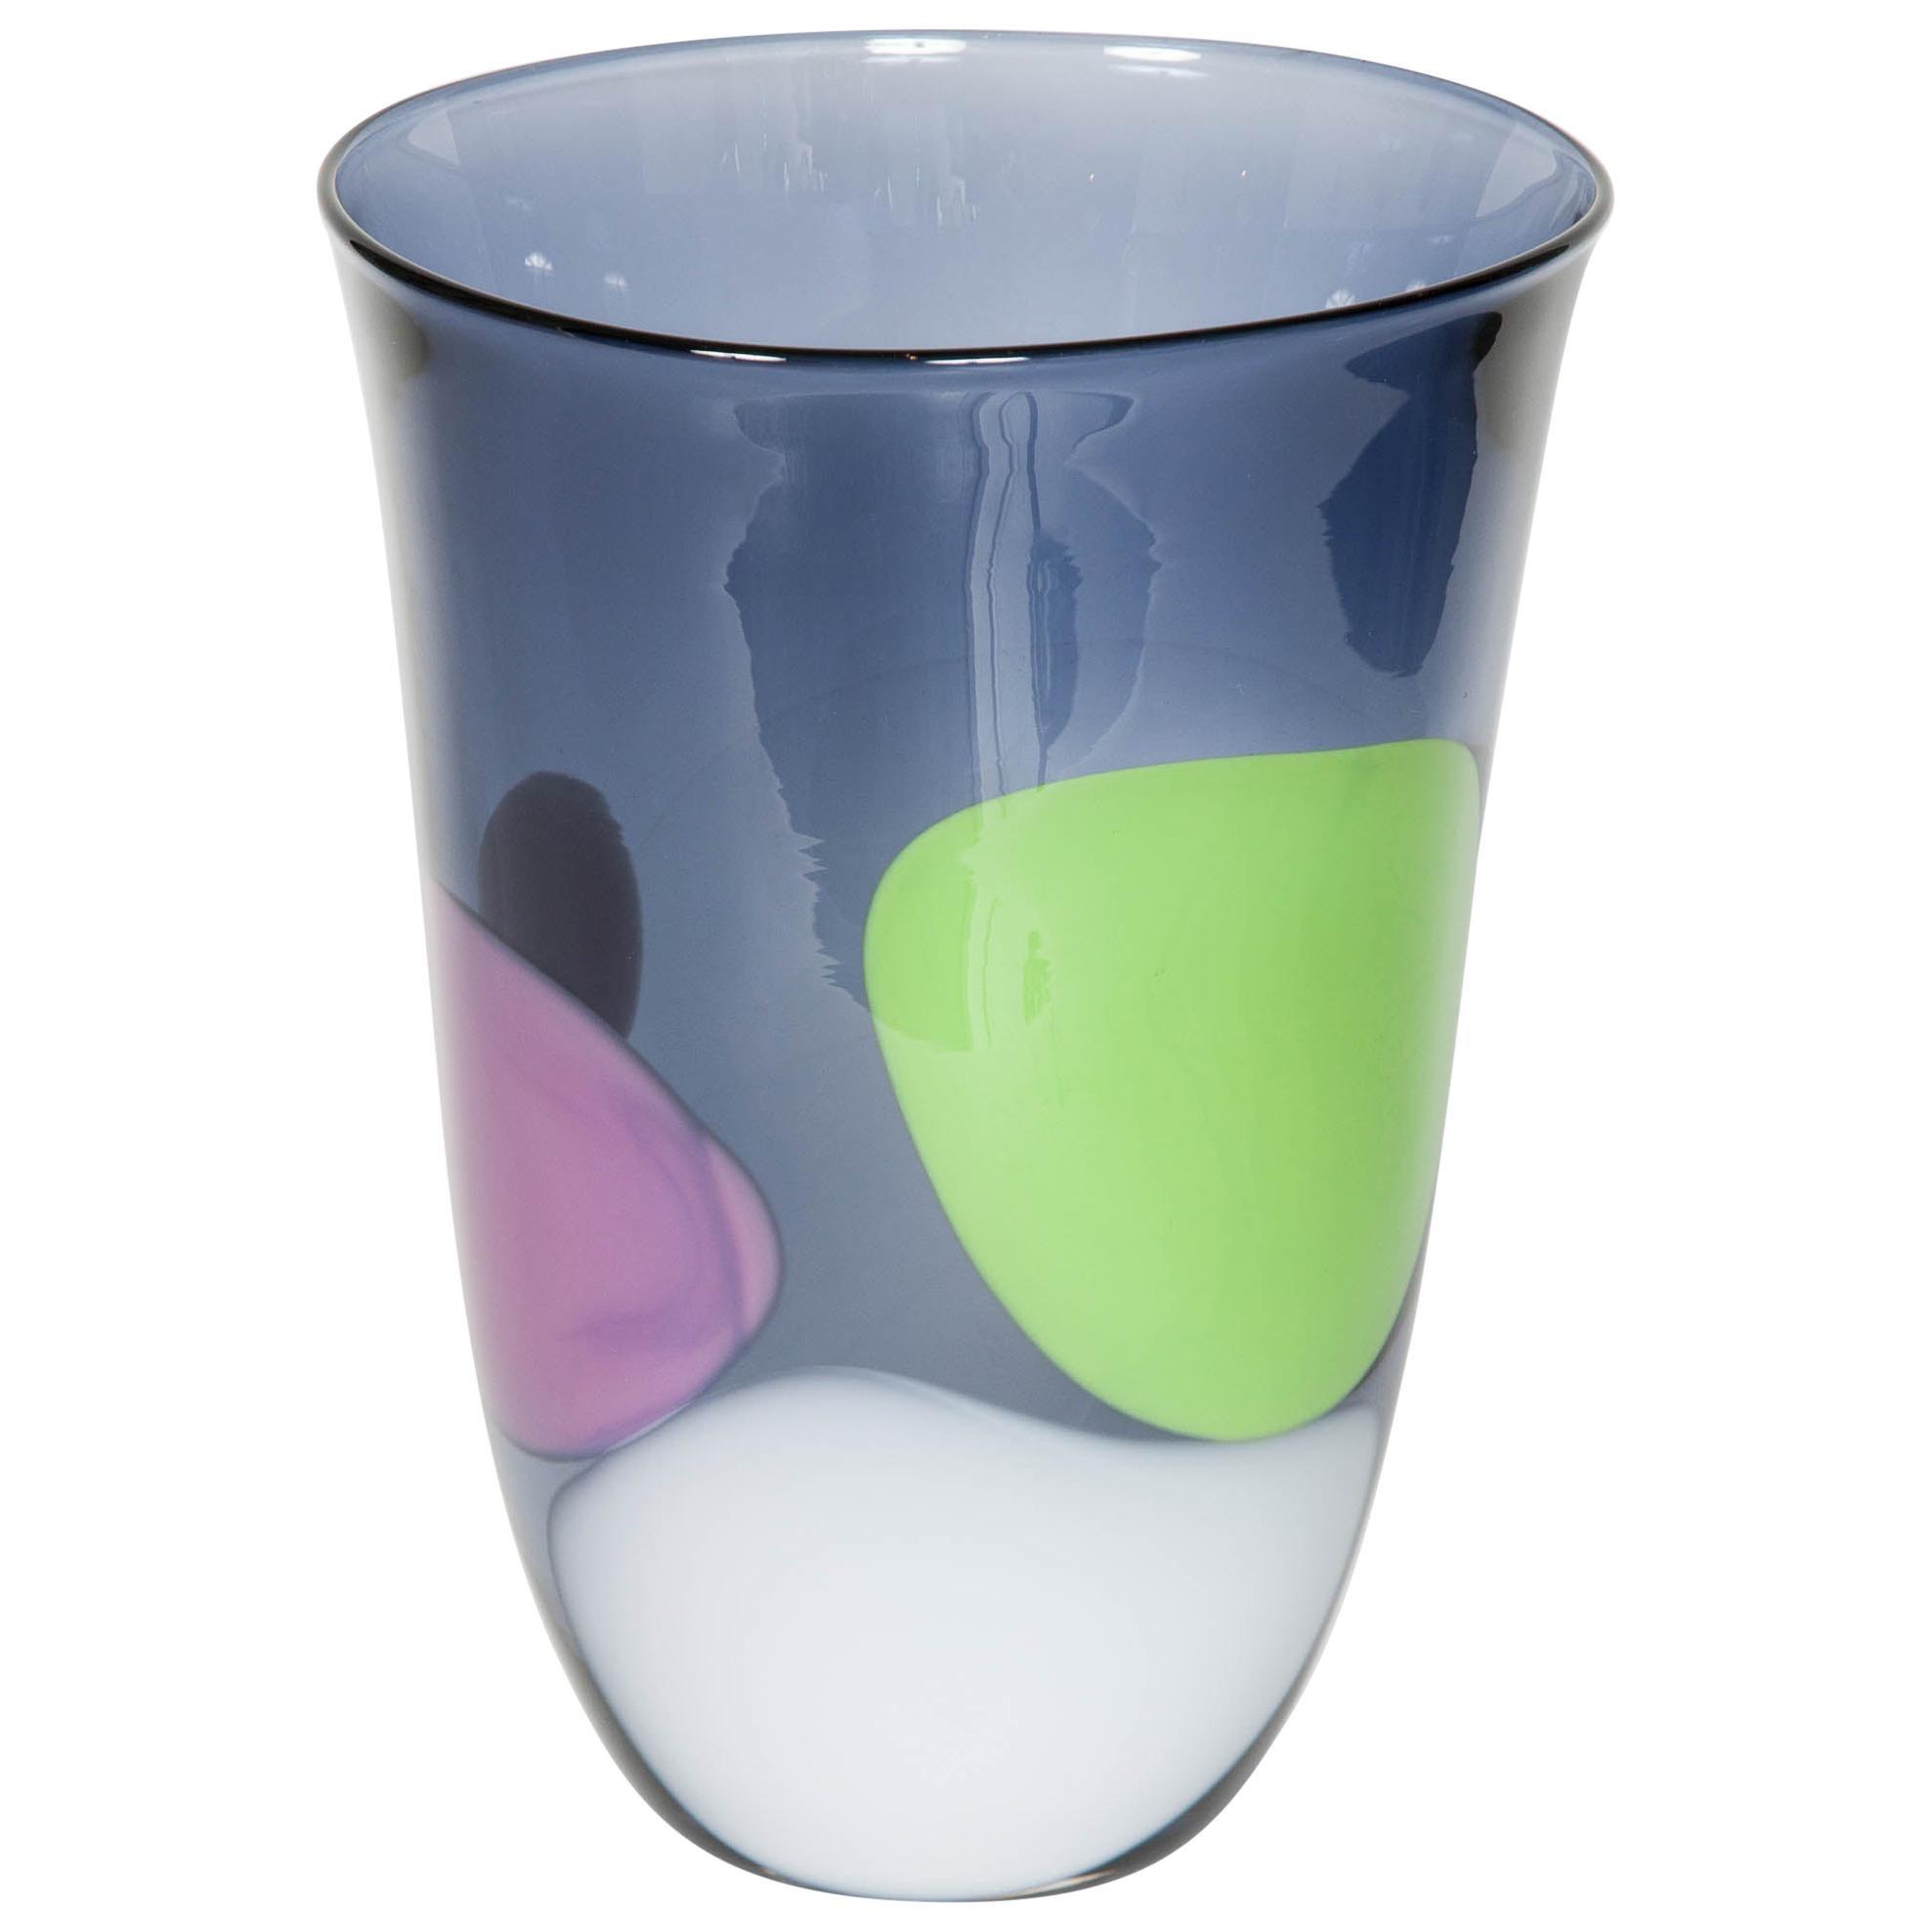 Cunonia, a Unique steel blue, pink, green & white Glass Vase by Gunnel Sahlin